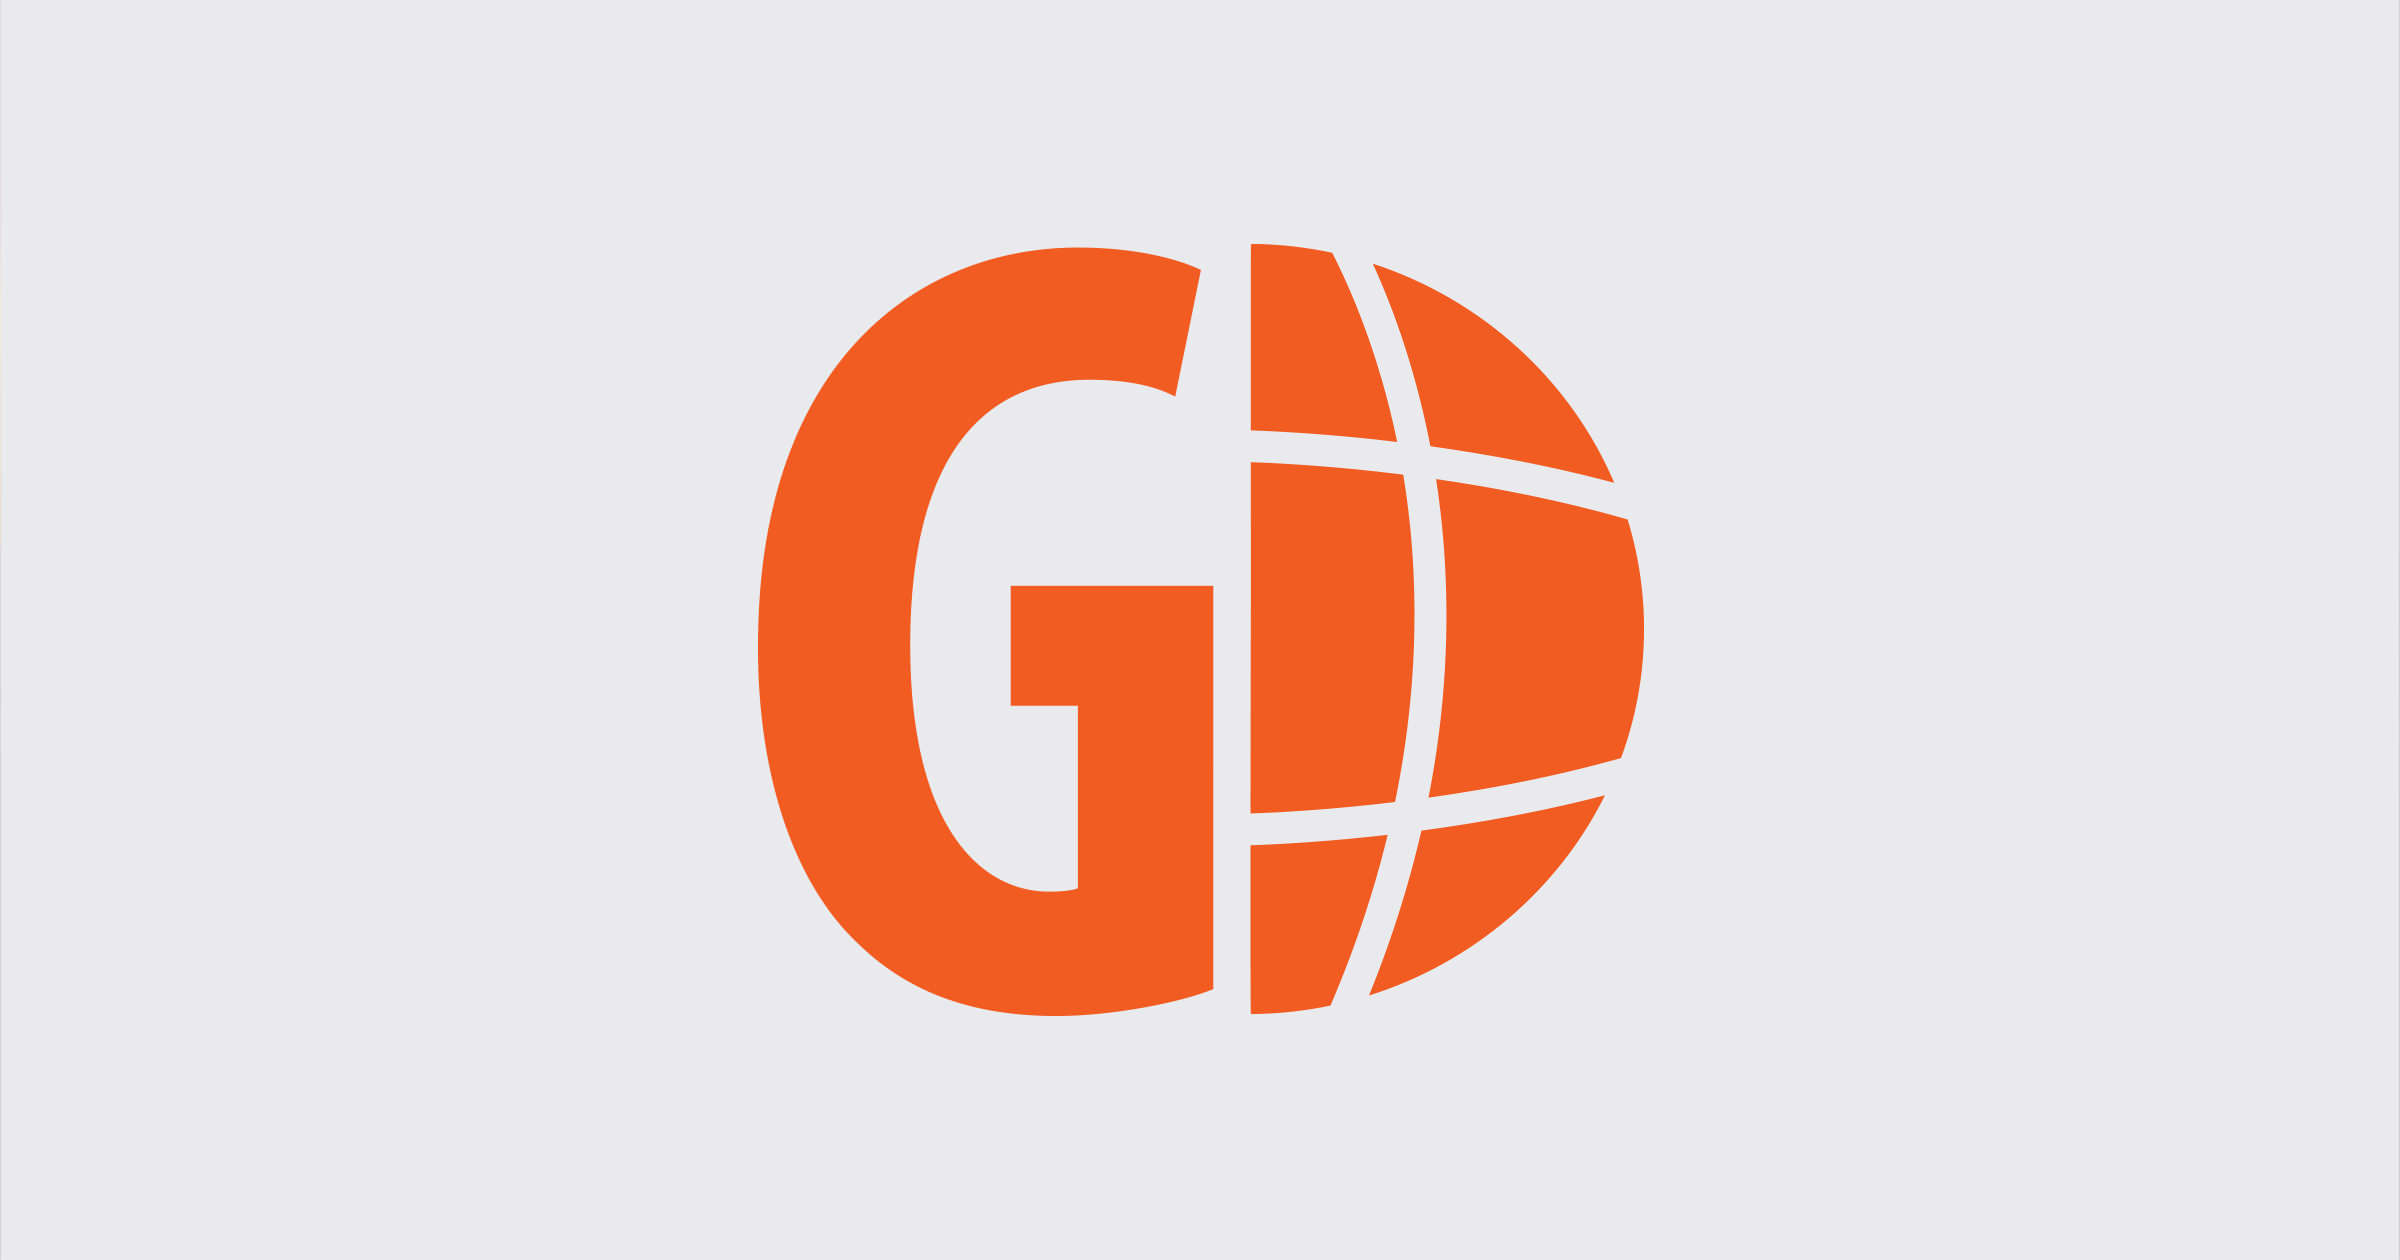 Indicator Rankings & Analysis | Global Innovation Index